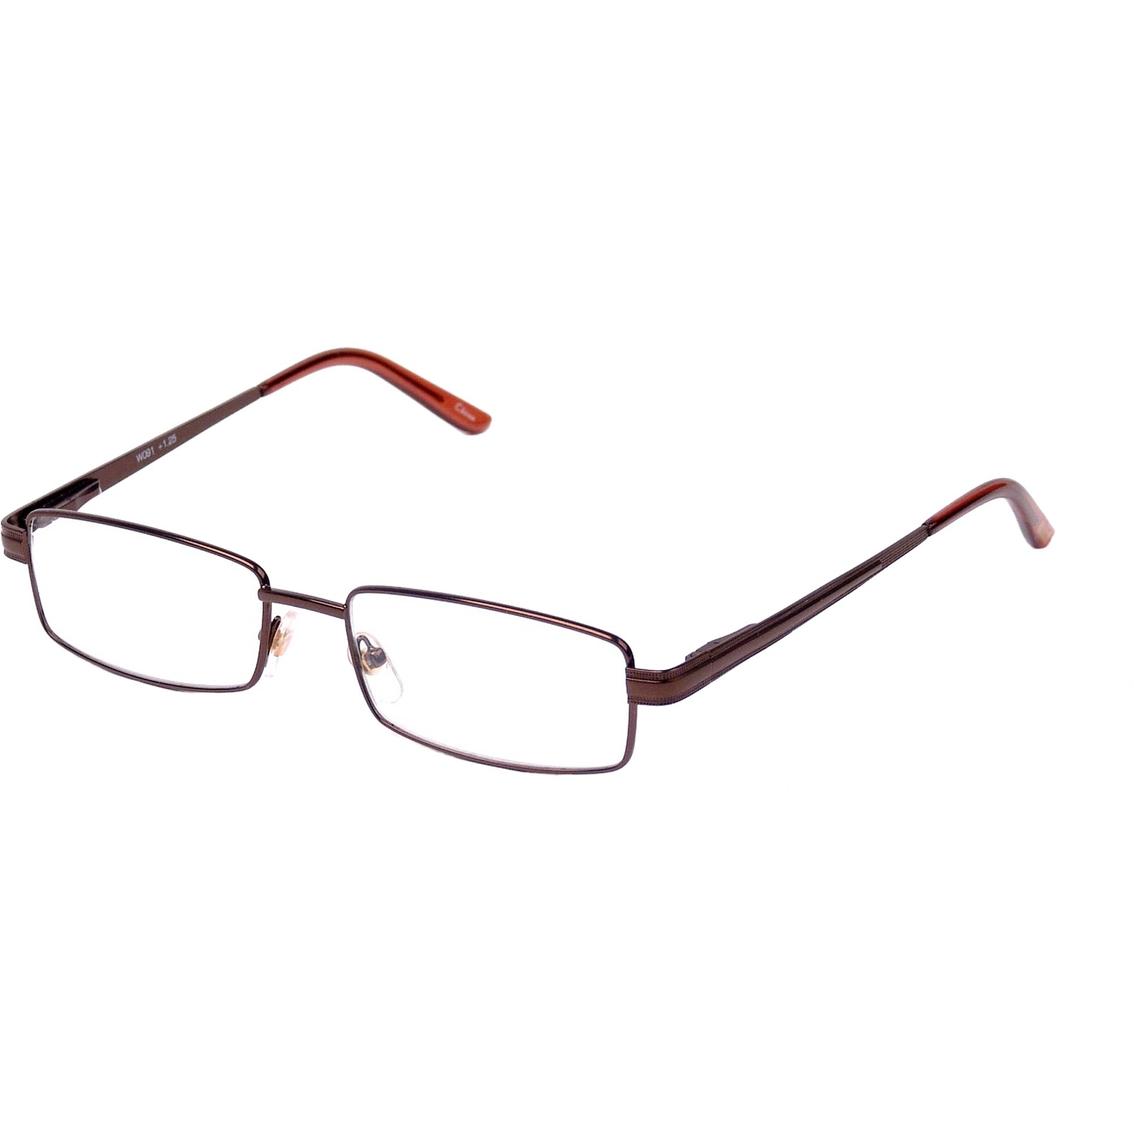 9c102fc47b4 Foster Grant Fg Classic Axton Reading Glasses